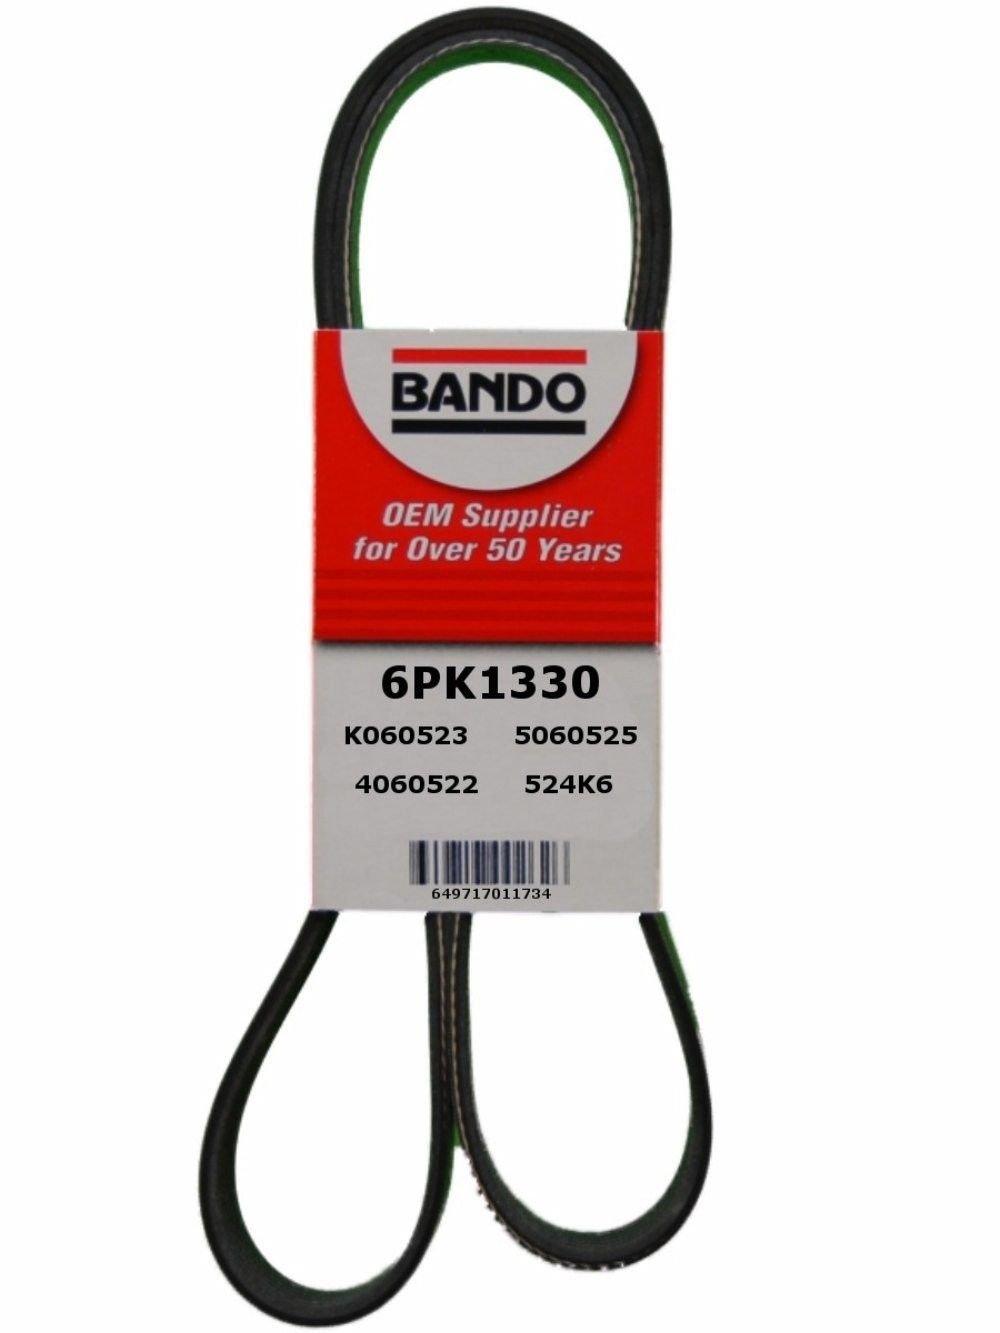 Mercedes-Benz SLK230 Serpentine Belt Replacement (Bando, CRP